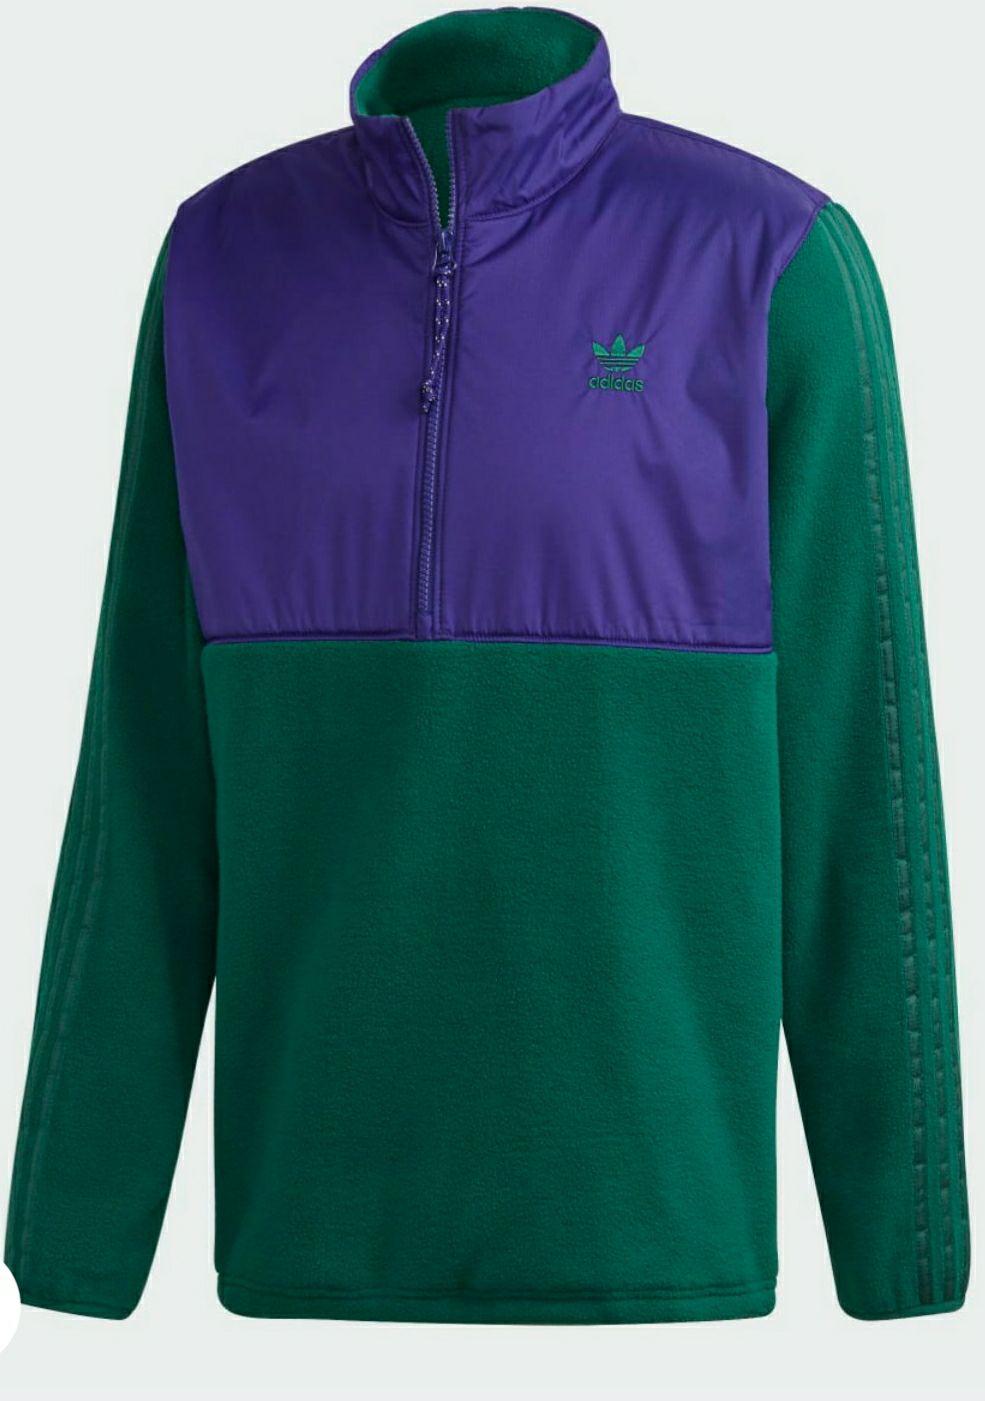 Adidas Originals Polar Fleece 1/4 Zip Top - £22 Delivered @ Next